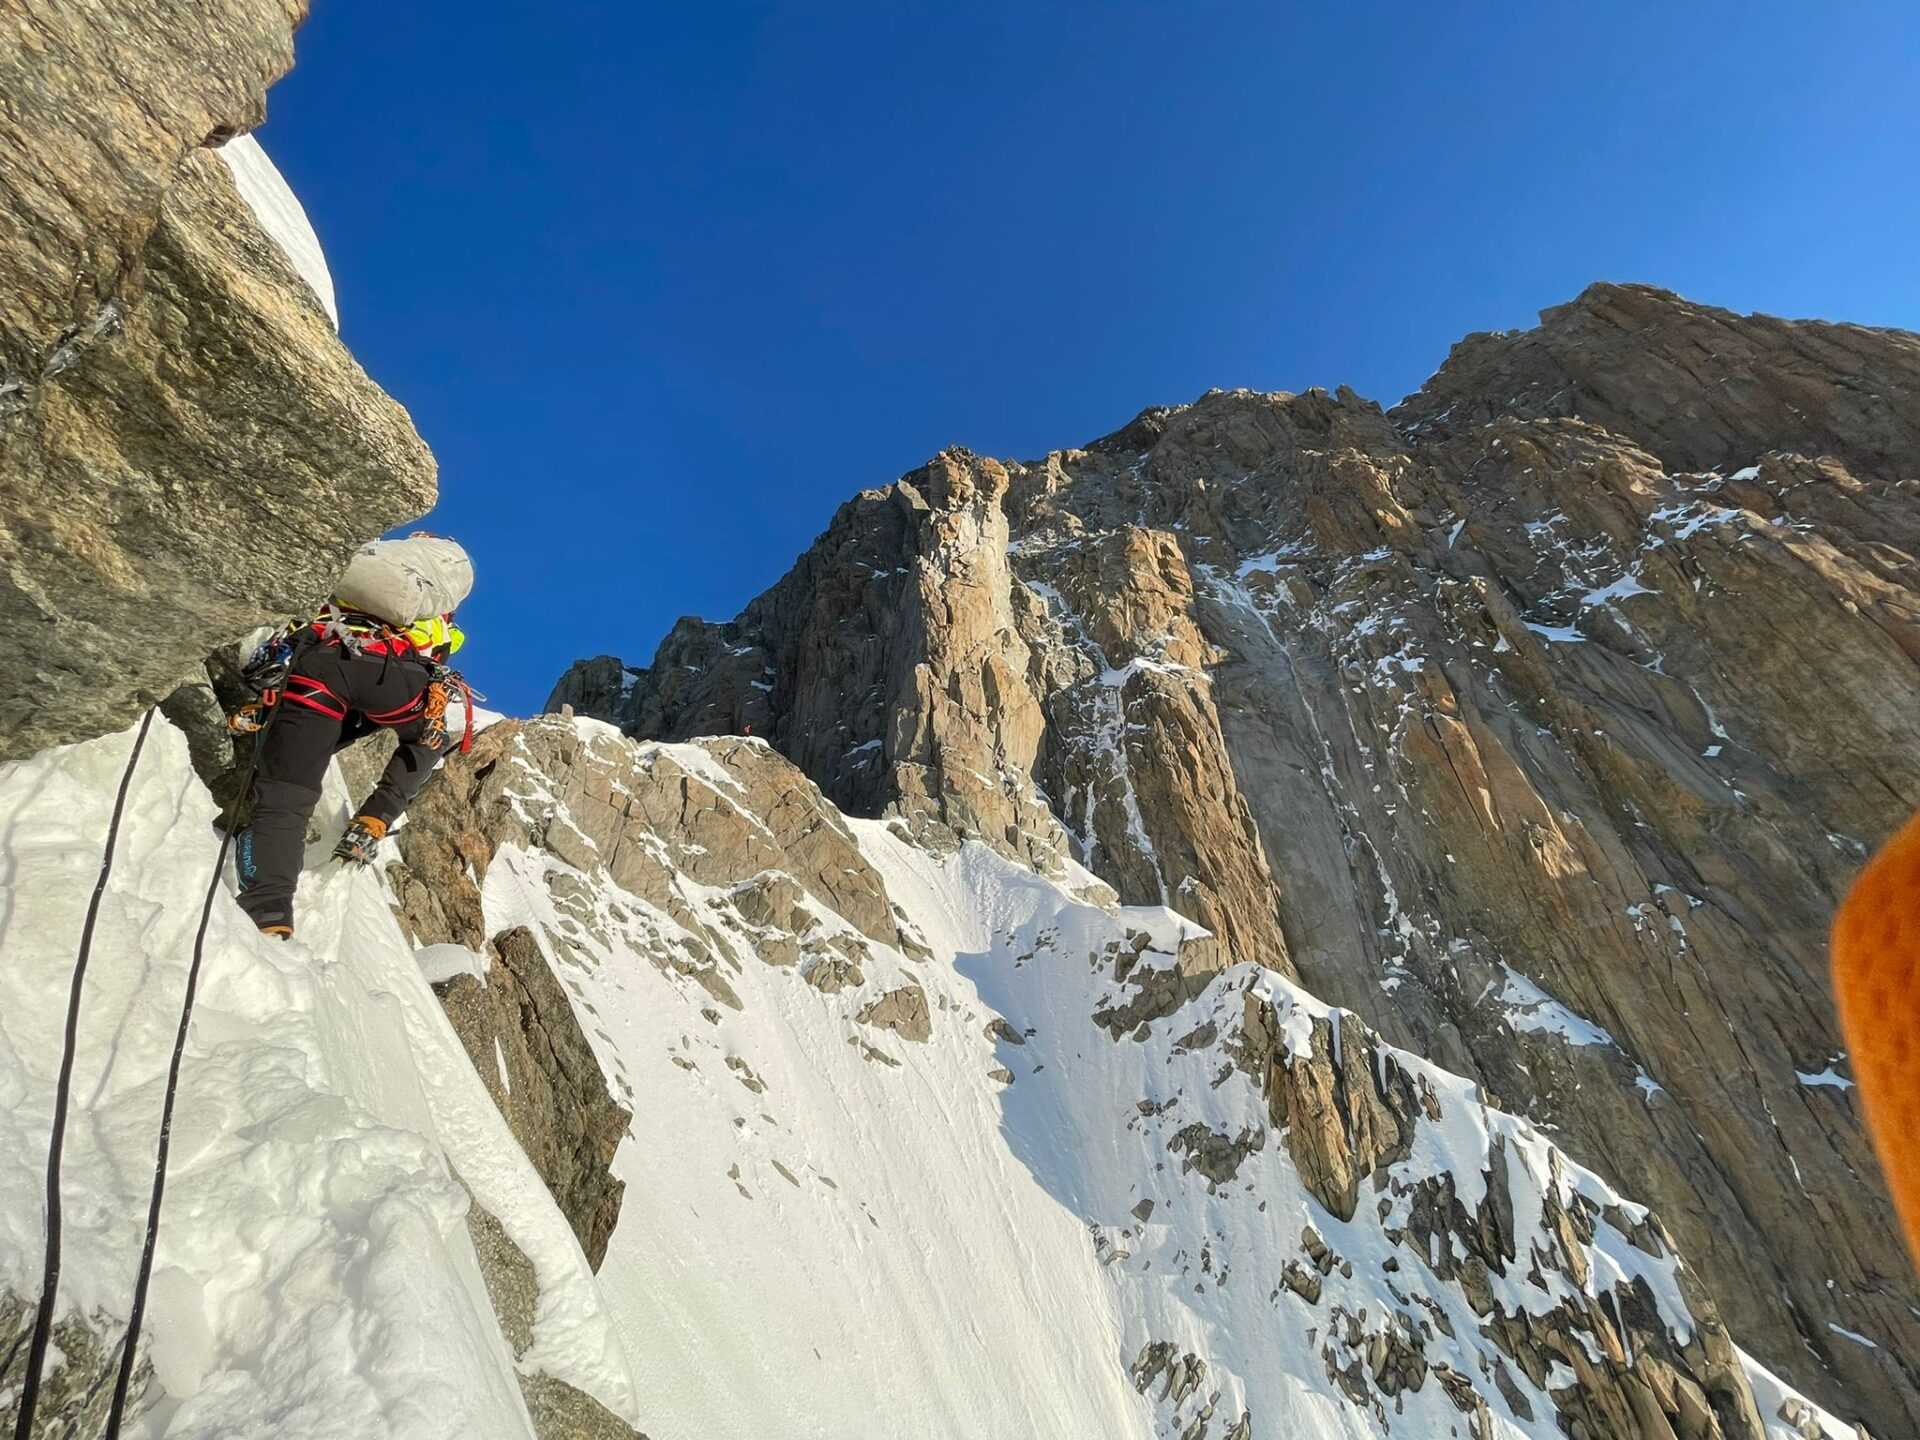 Recuperati due alpinisti Monte Bianco